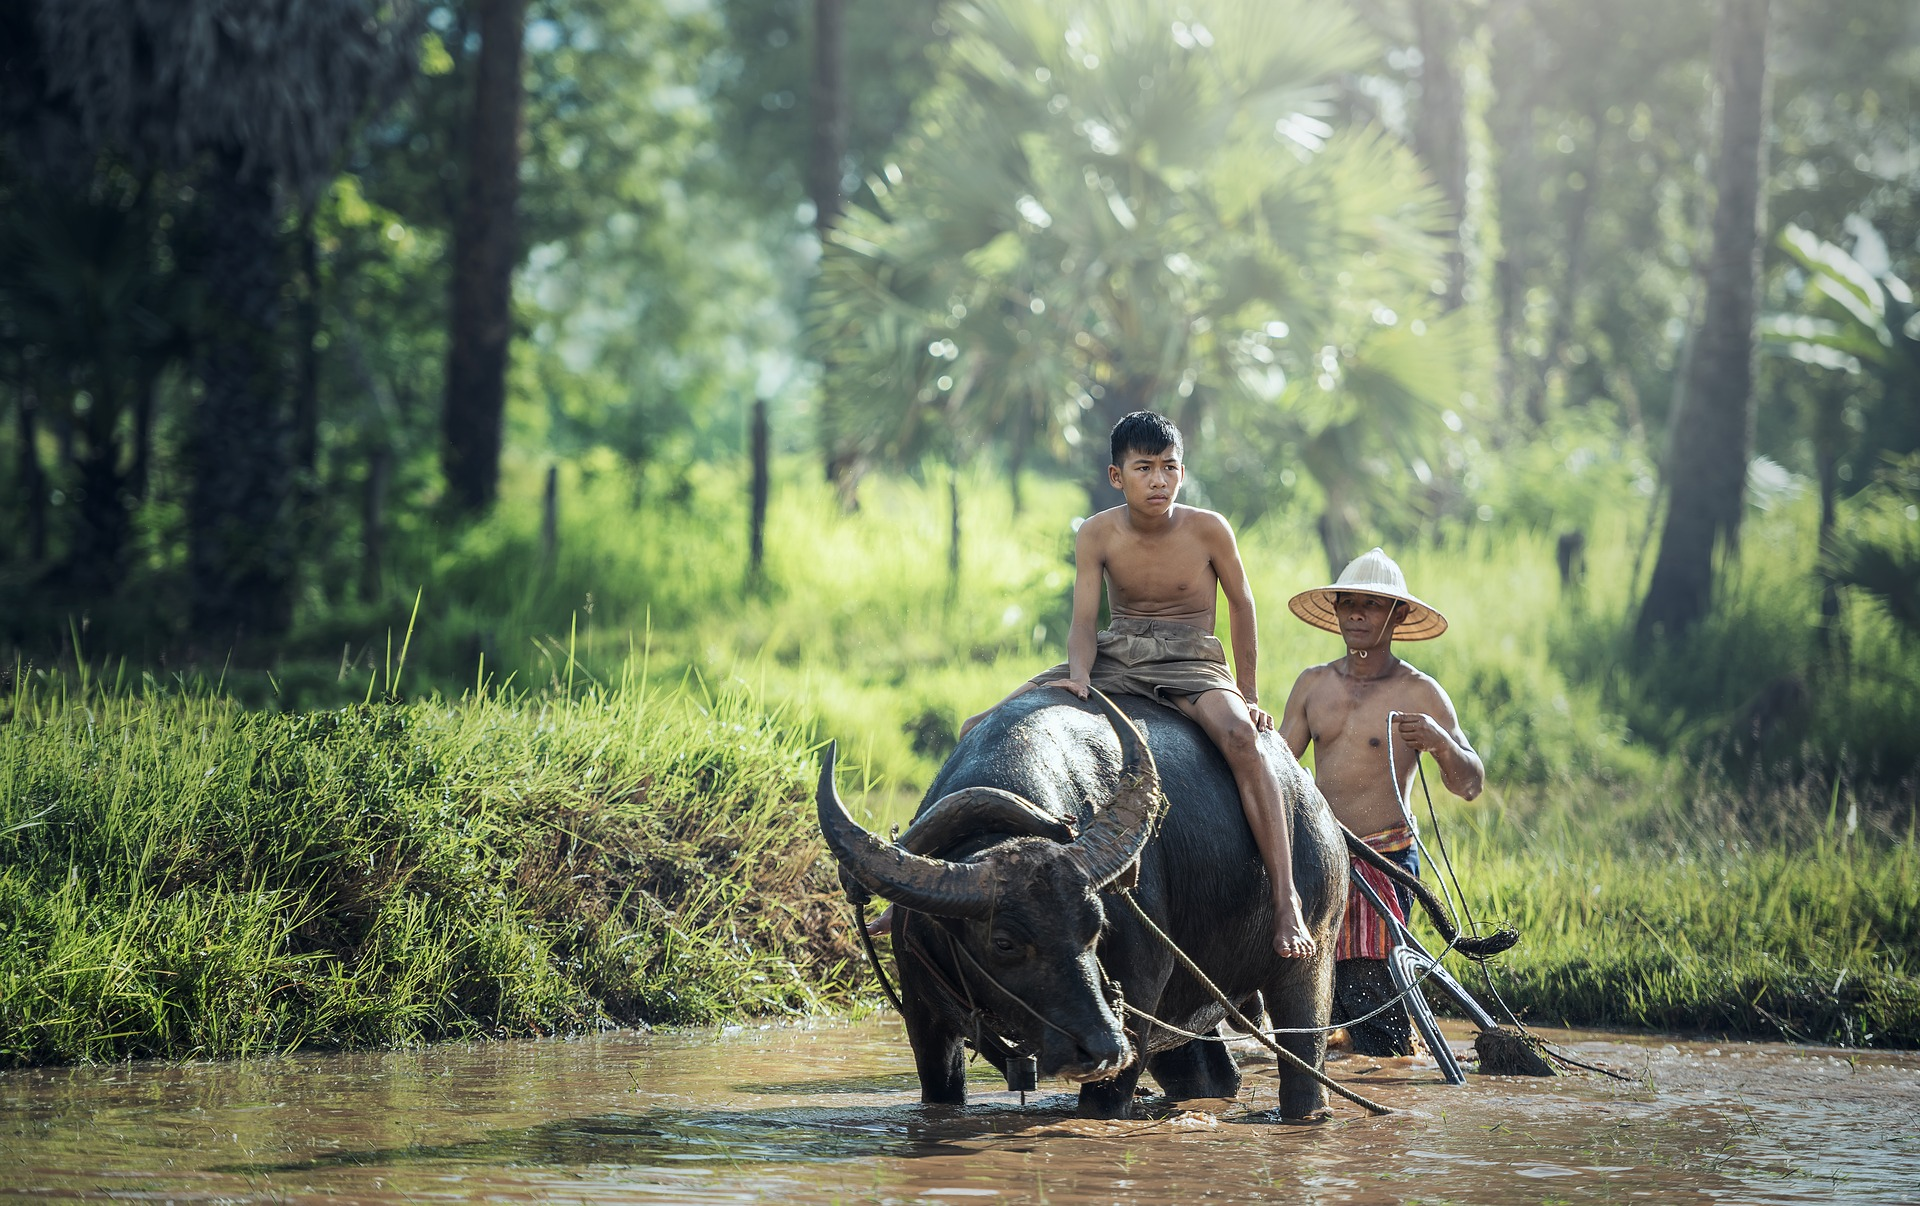 Buffalo Riding Agriculture Asia_ Cambodia_1807517_P